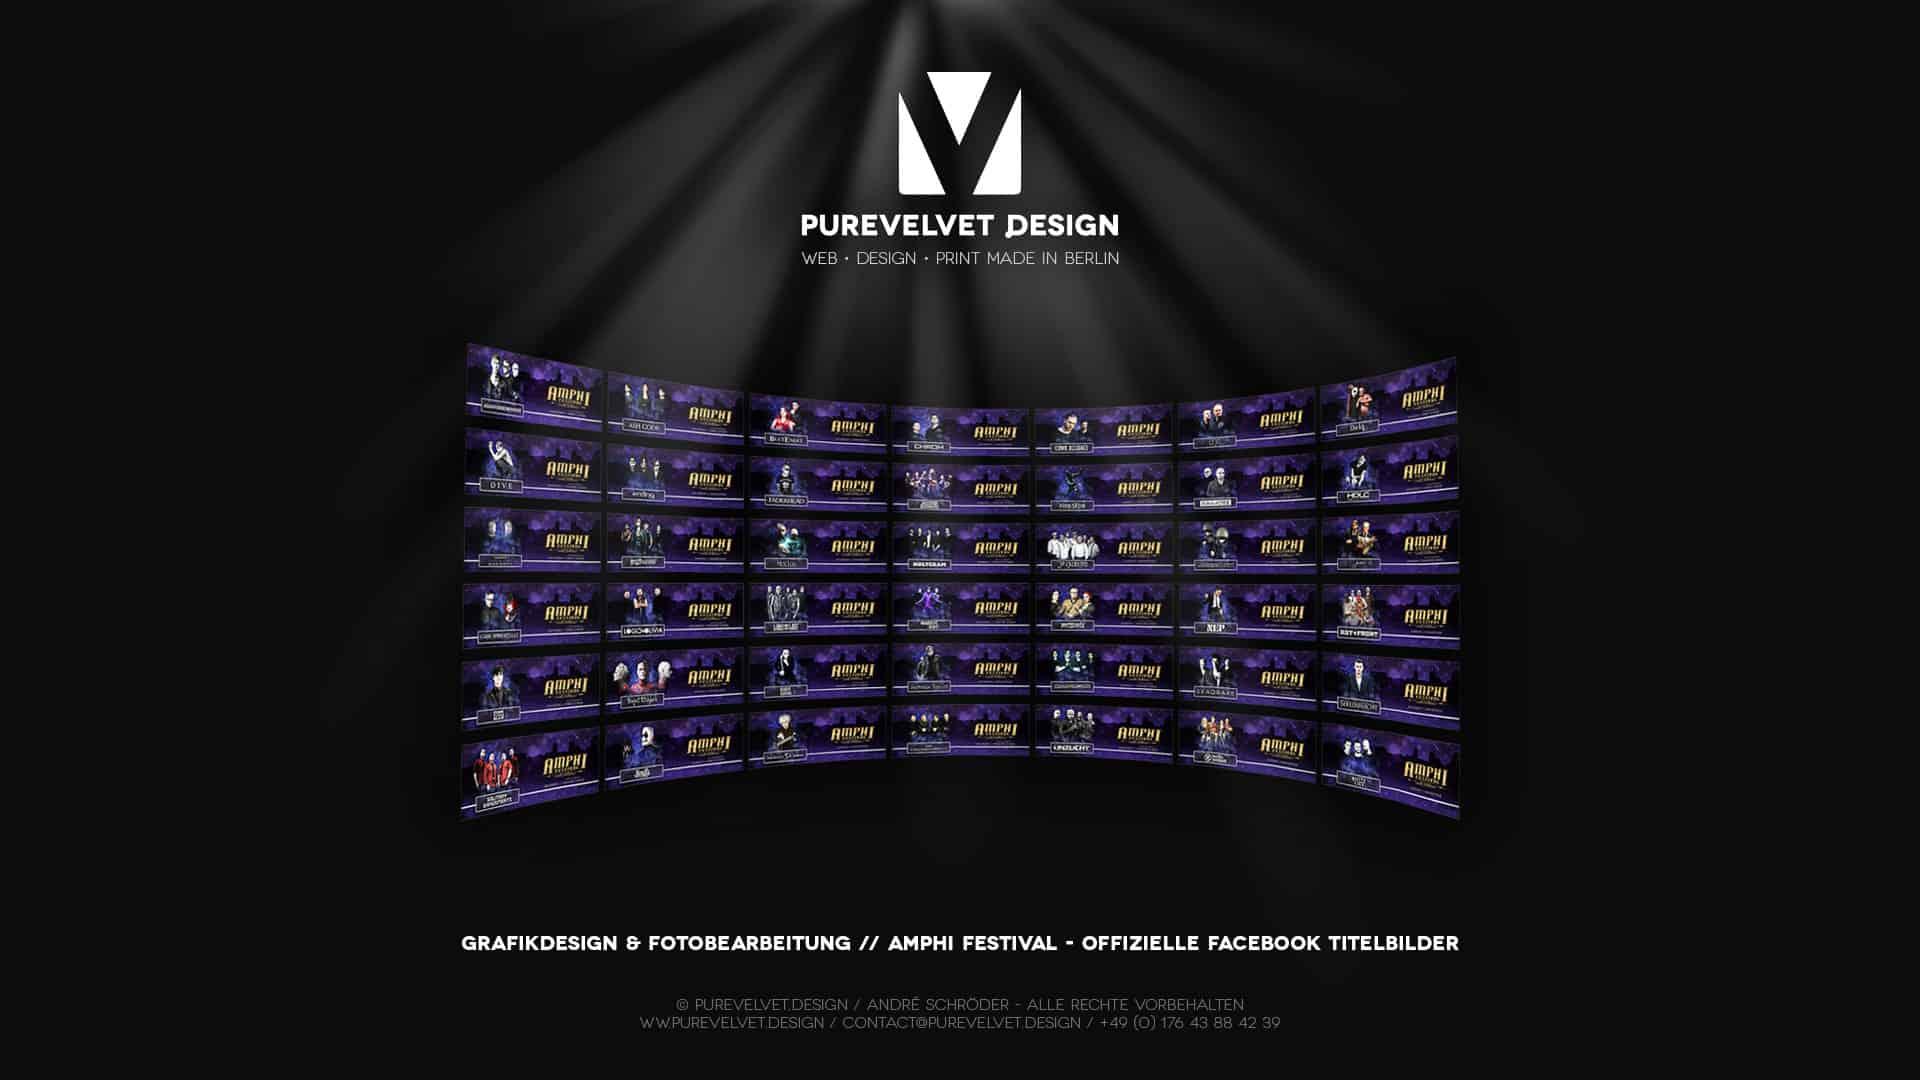 Grafikdesign Referenz - Amphi Festival 2020 - Facebook Titelbilder